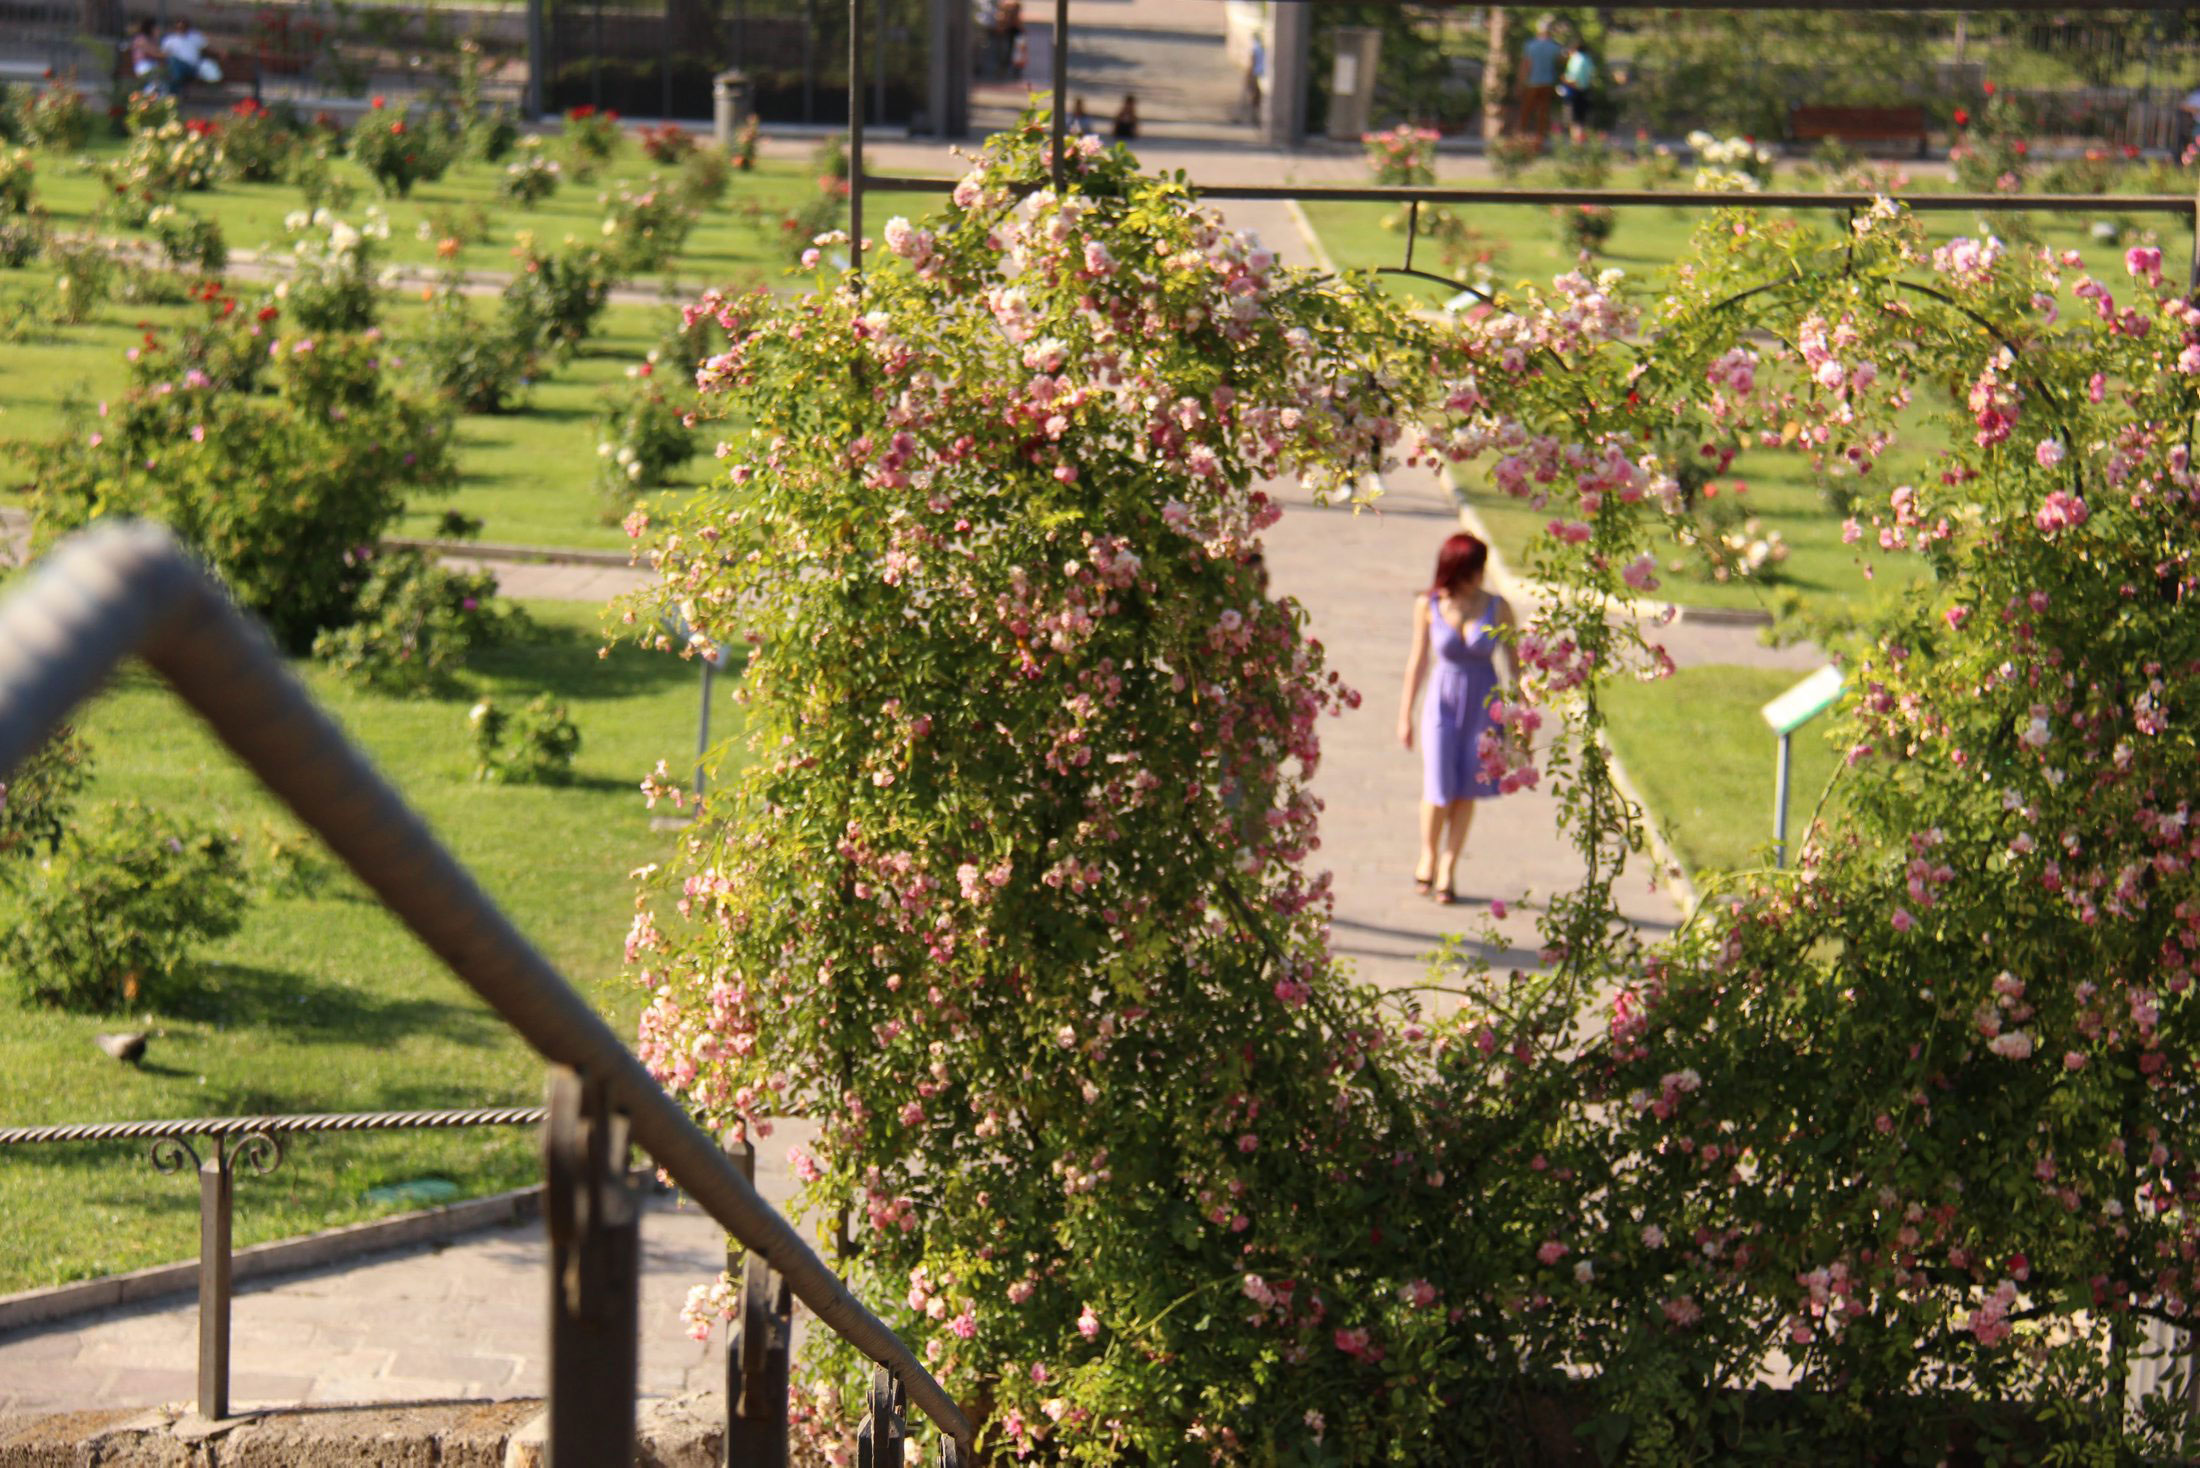 Sub rosa: a Rome garden with a secret Jewish past - Jewish World ...